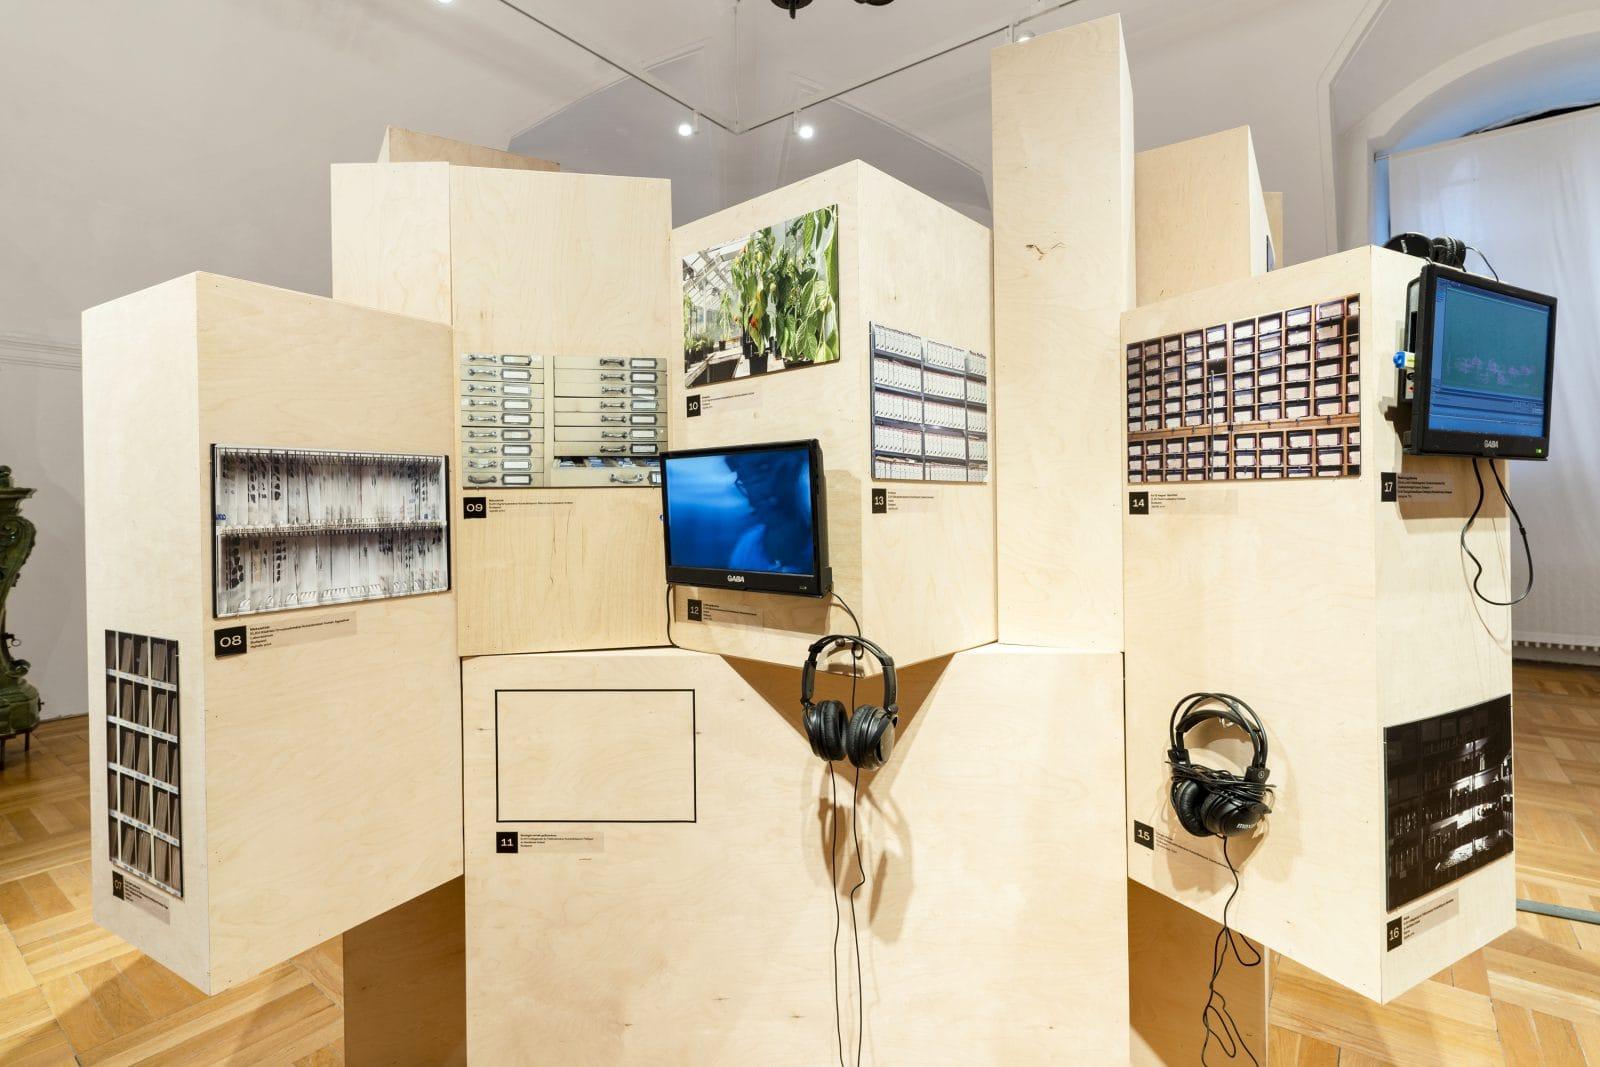 Exhibition academia (an exploratory journey). Photo: Zsuzsanna Simon